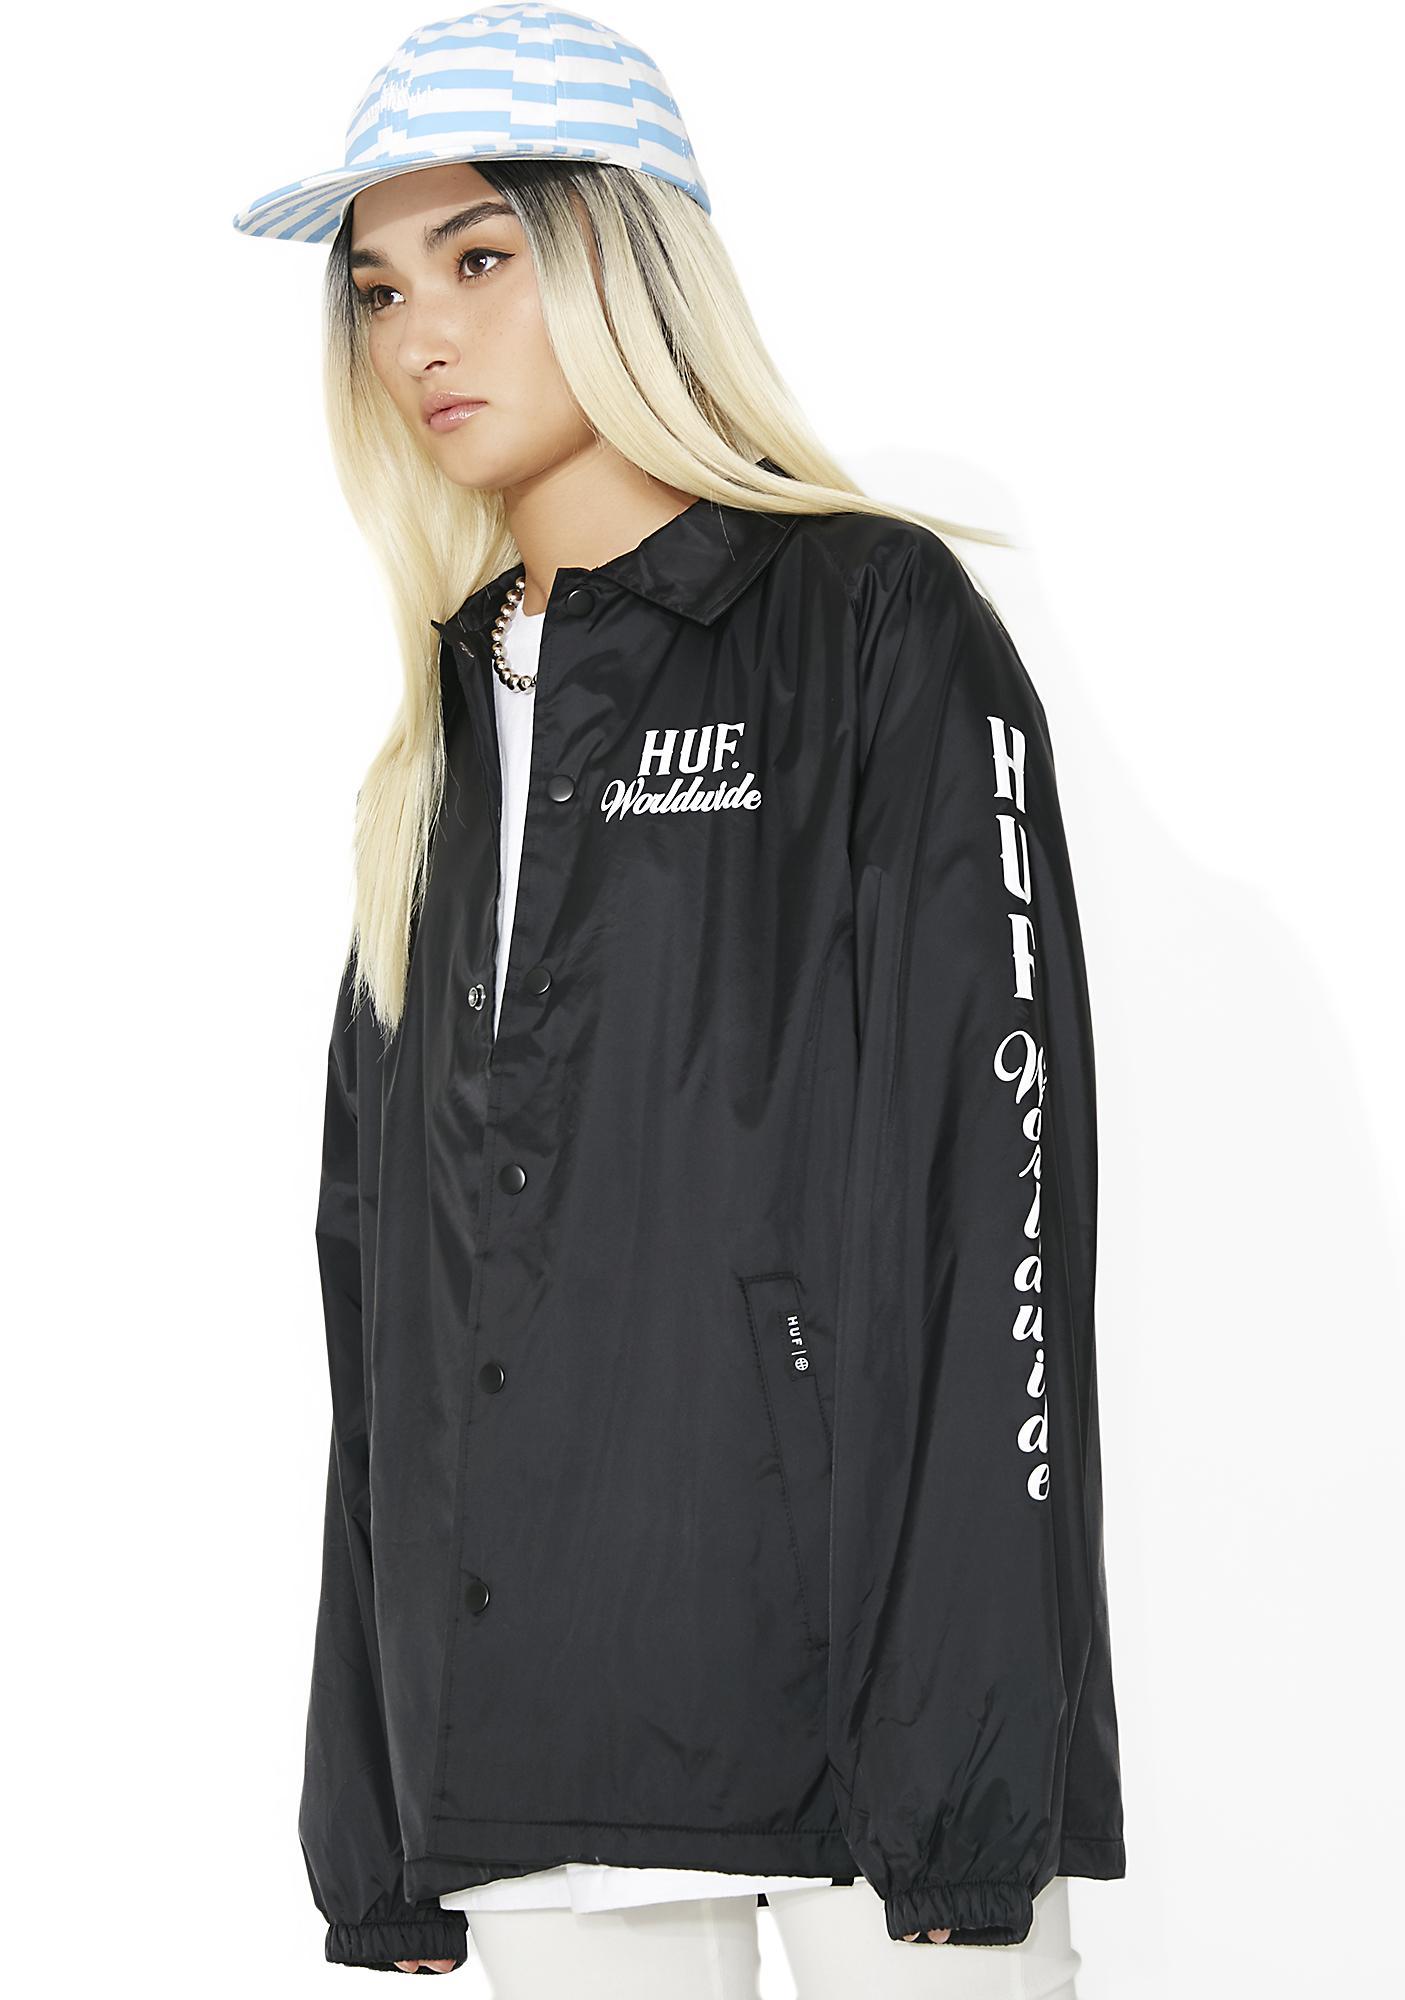 HUF Ultra Coaches Jacket